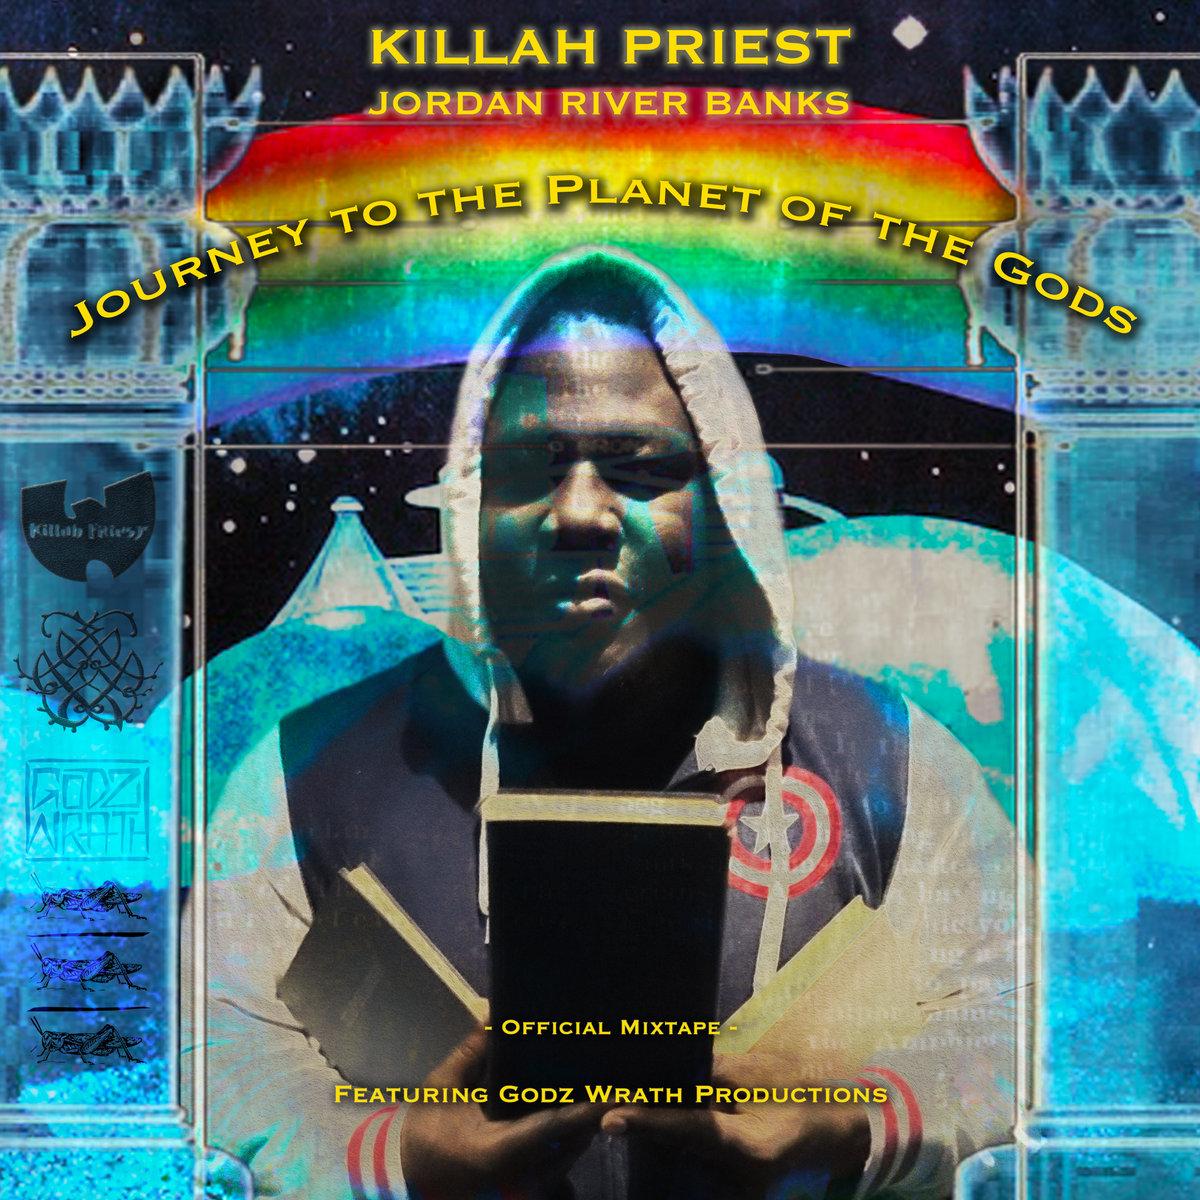 Journey To The Planet Of The Gods Killah Priest Jordan River